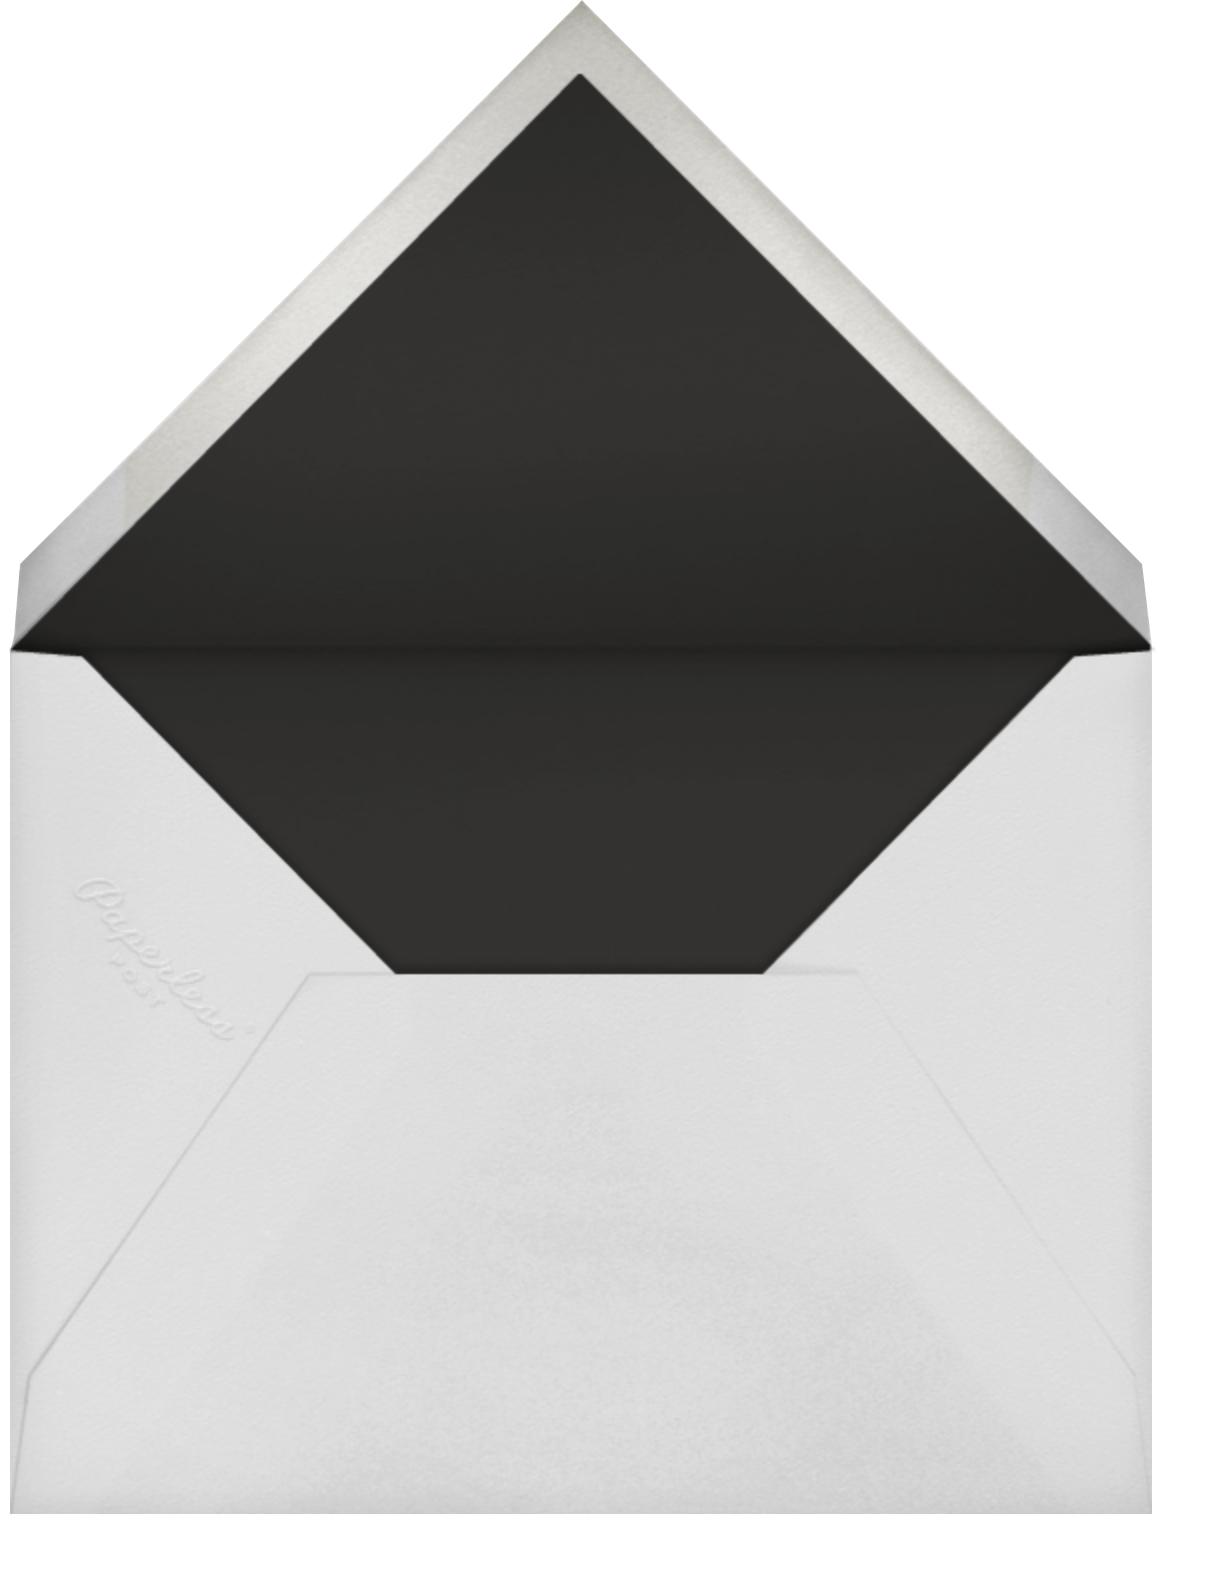 Party Penguins - kate spade new york - Envelope